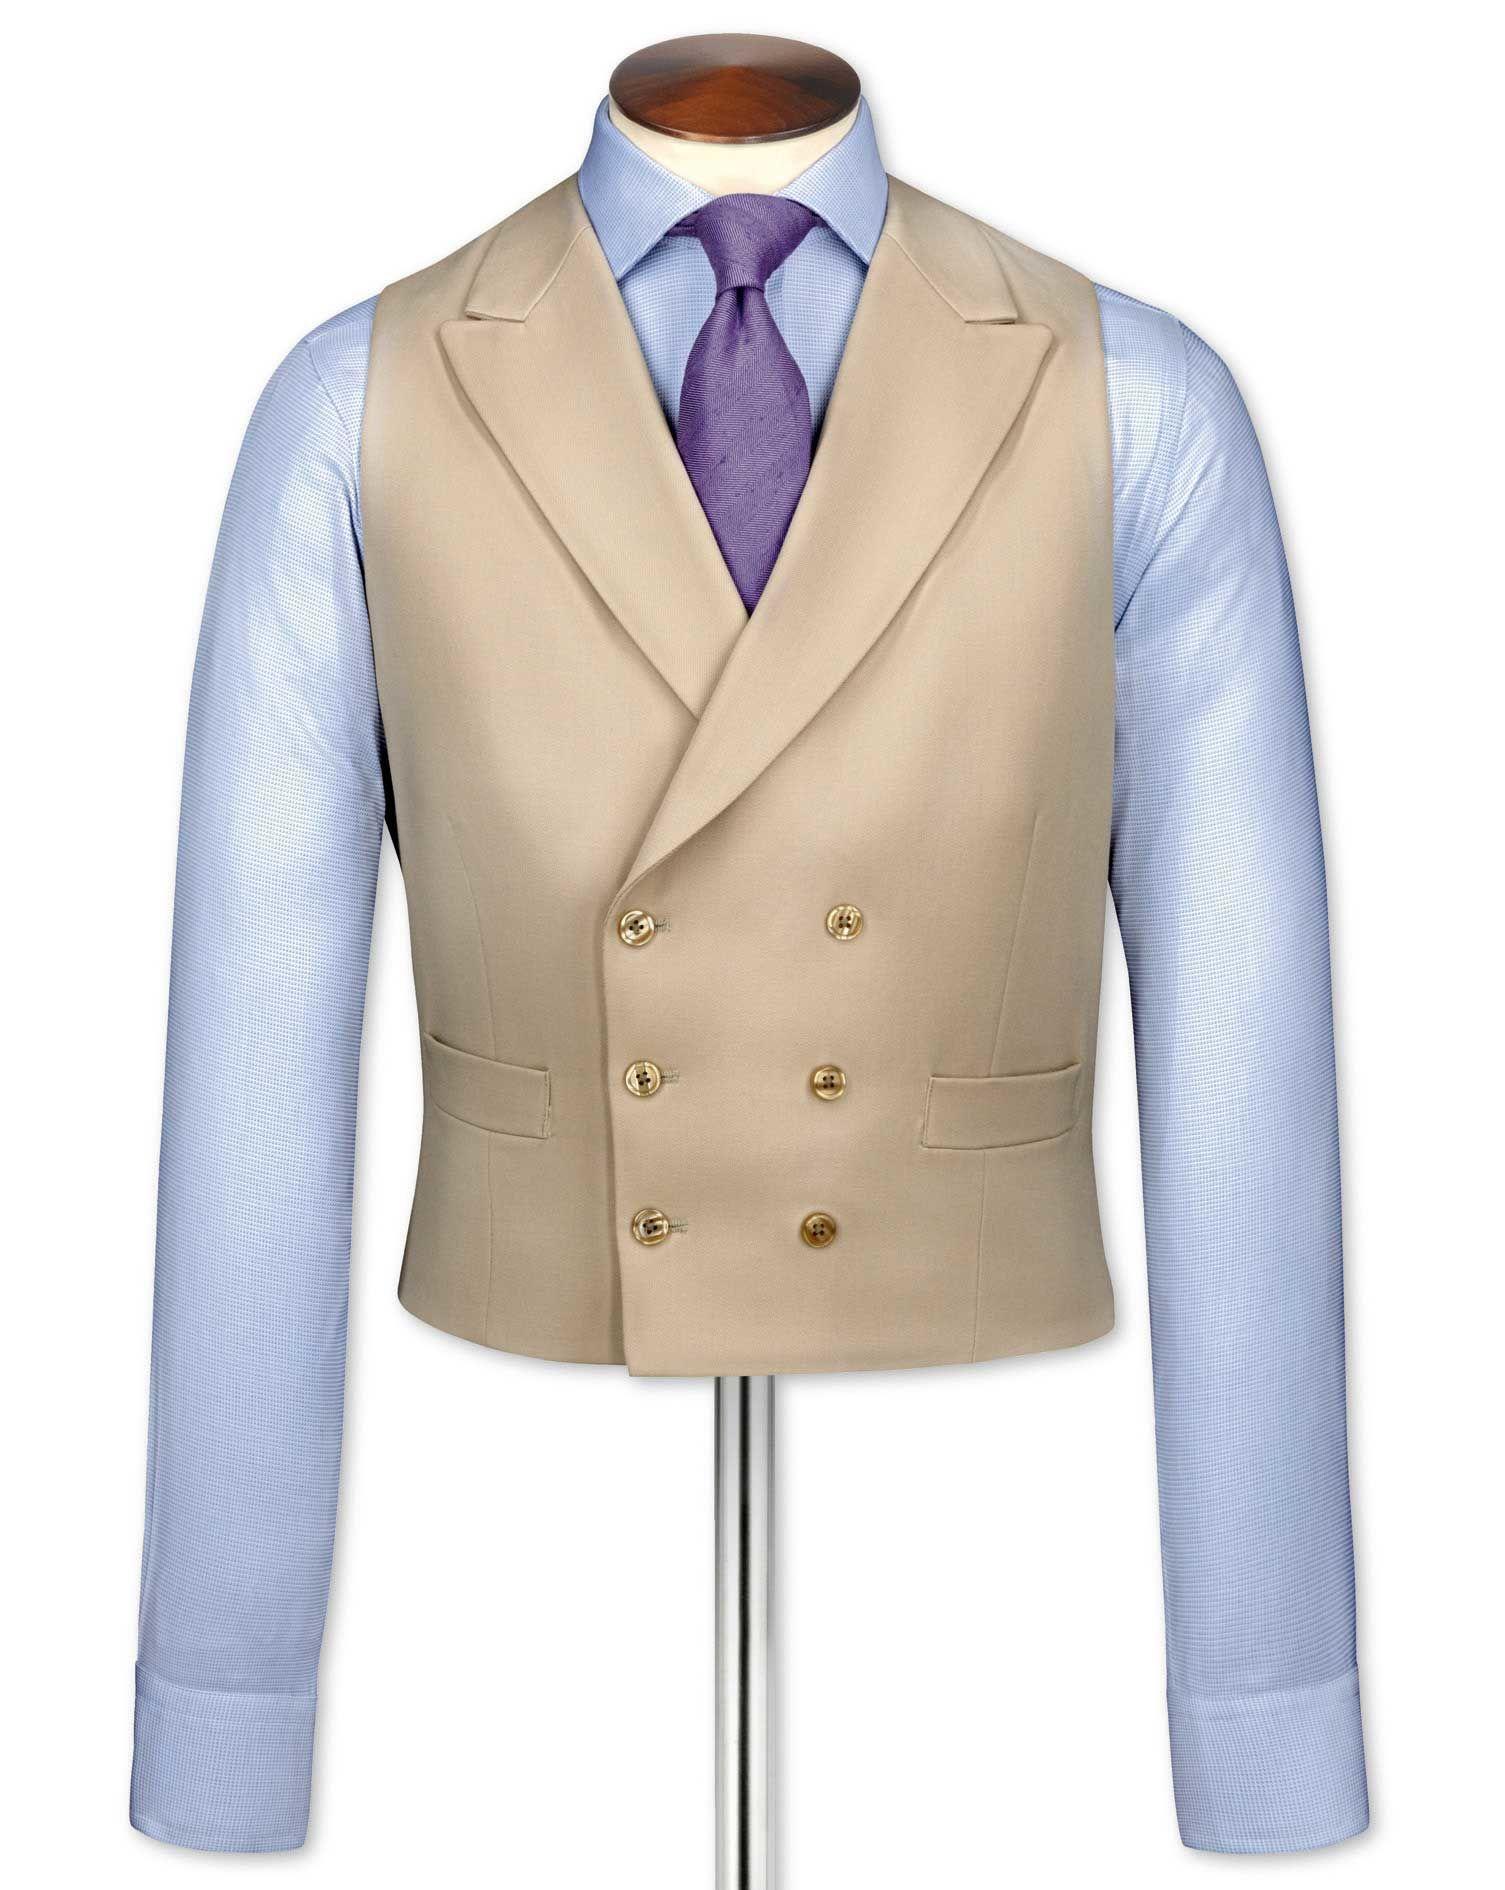 69d6e8b735e Men s Vintage Inspired Vests Buff Morning Suit Wool Waistcoat Size w48 by  Charles Tyrwhitt £160.00 AT vintagedancer.com